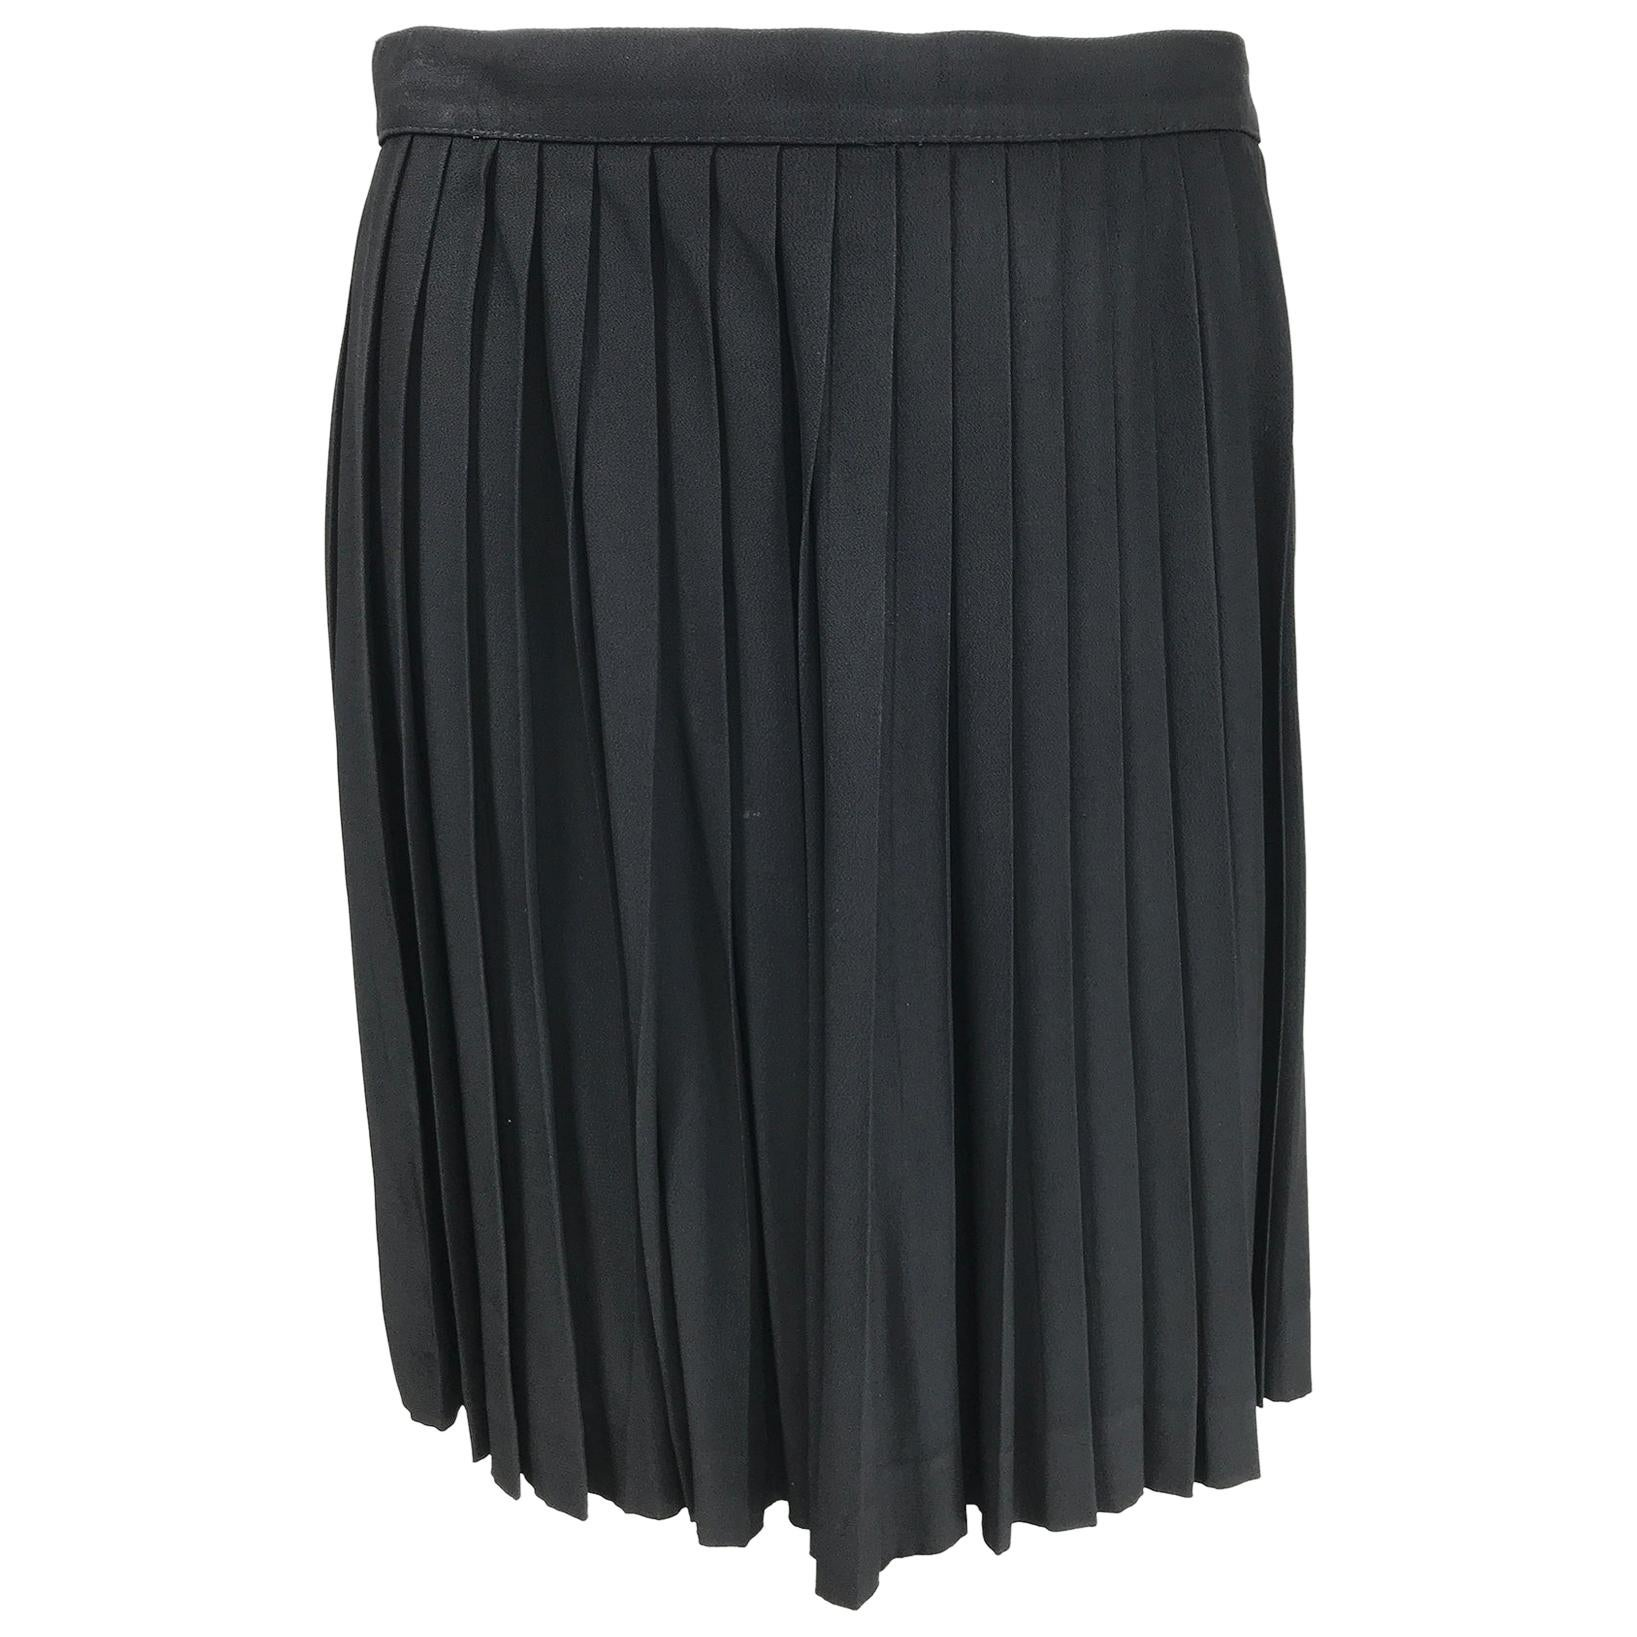 Thierry Mugler Black Crepe Side Snap Pleated Mini Skirt 1980s